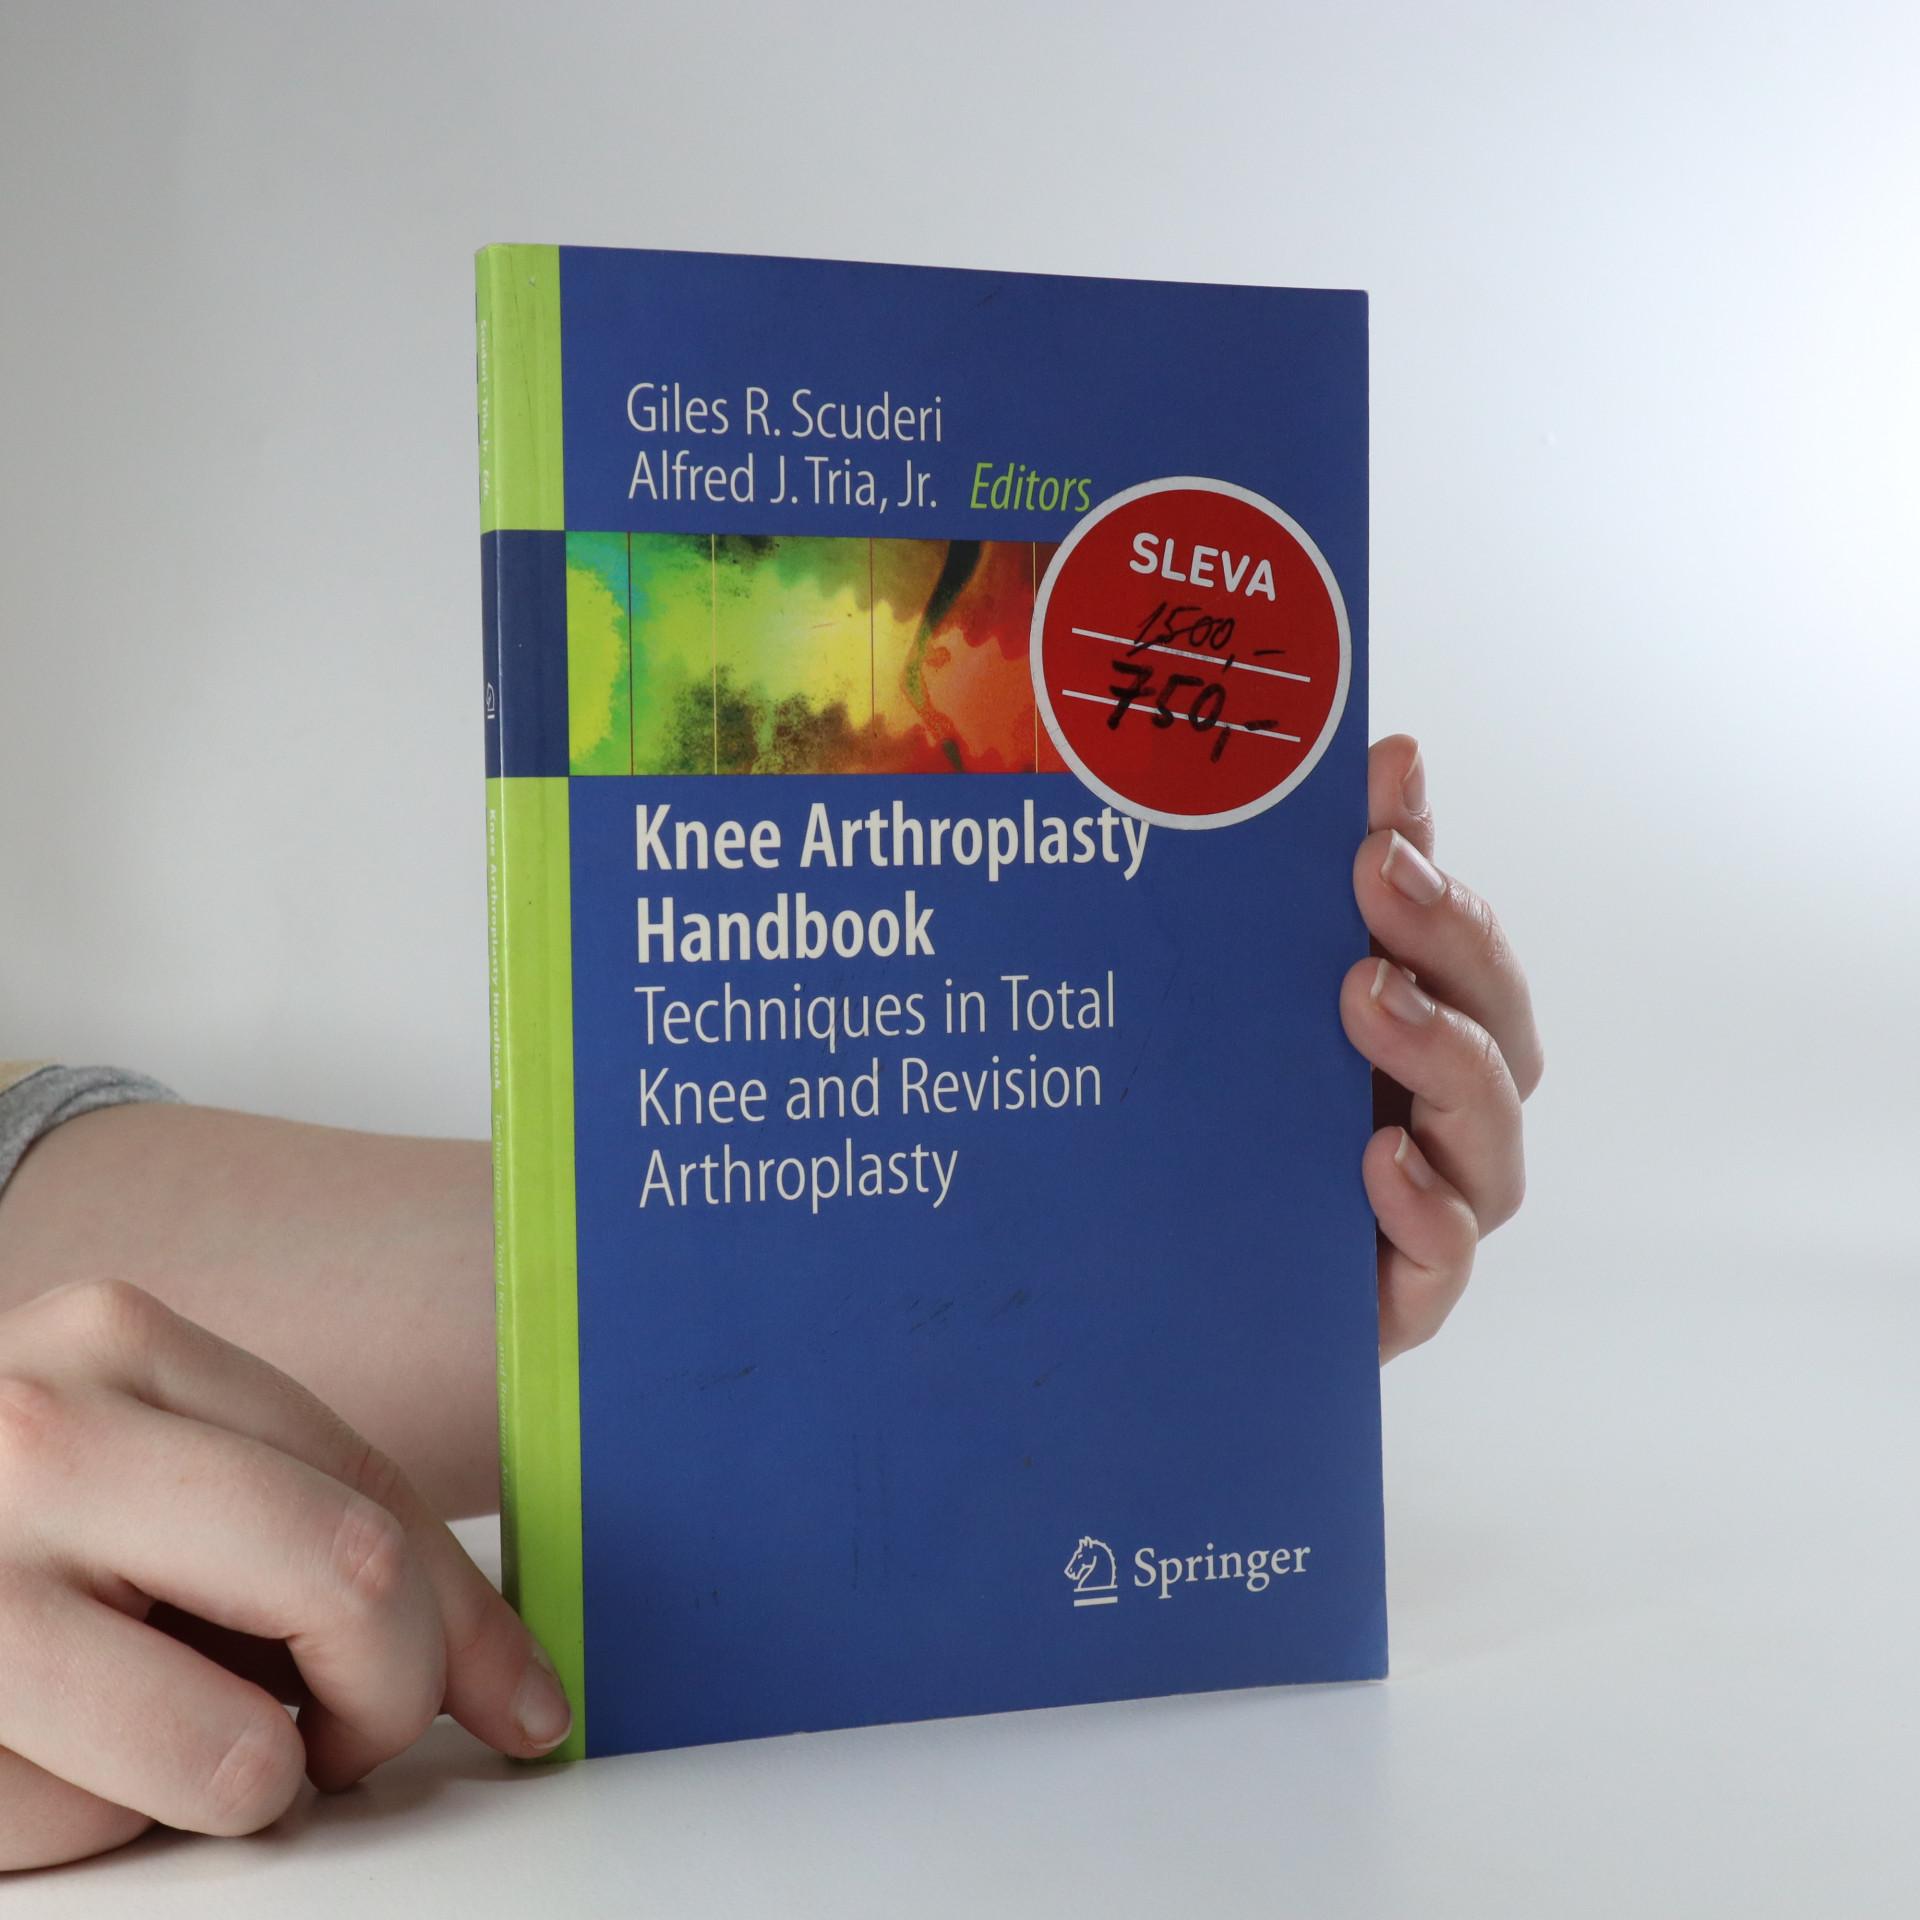 antikvární kniha Knee Arthroplasty Handbook. Techniques in Total Knee and Revision Arthroplasty, 2006